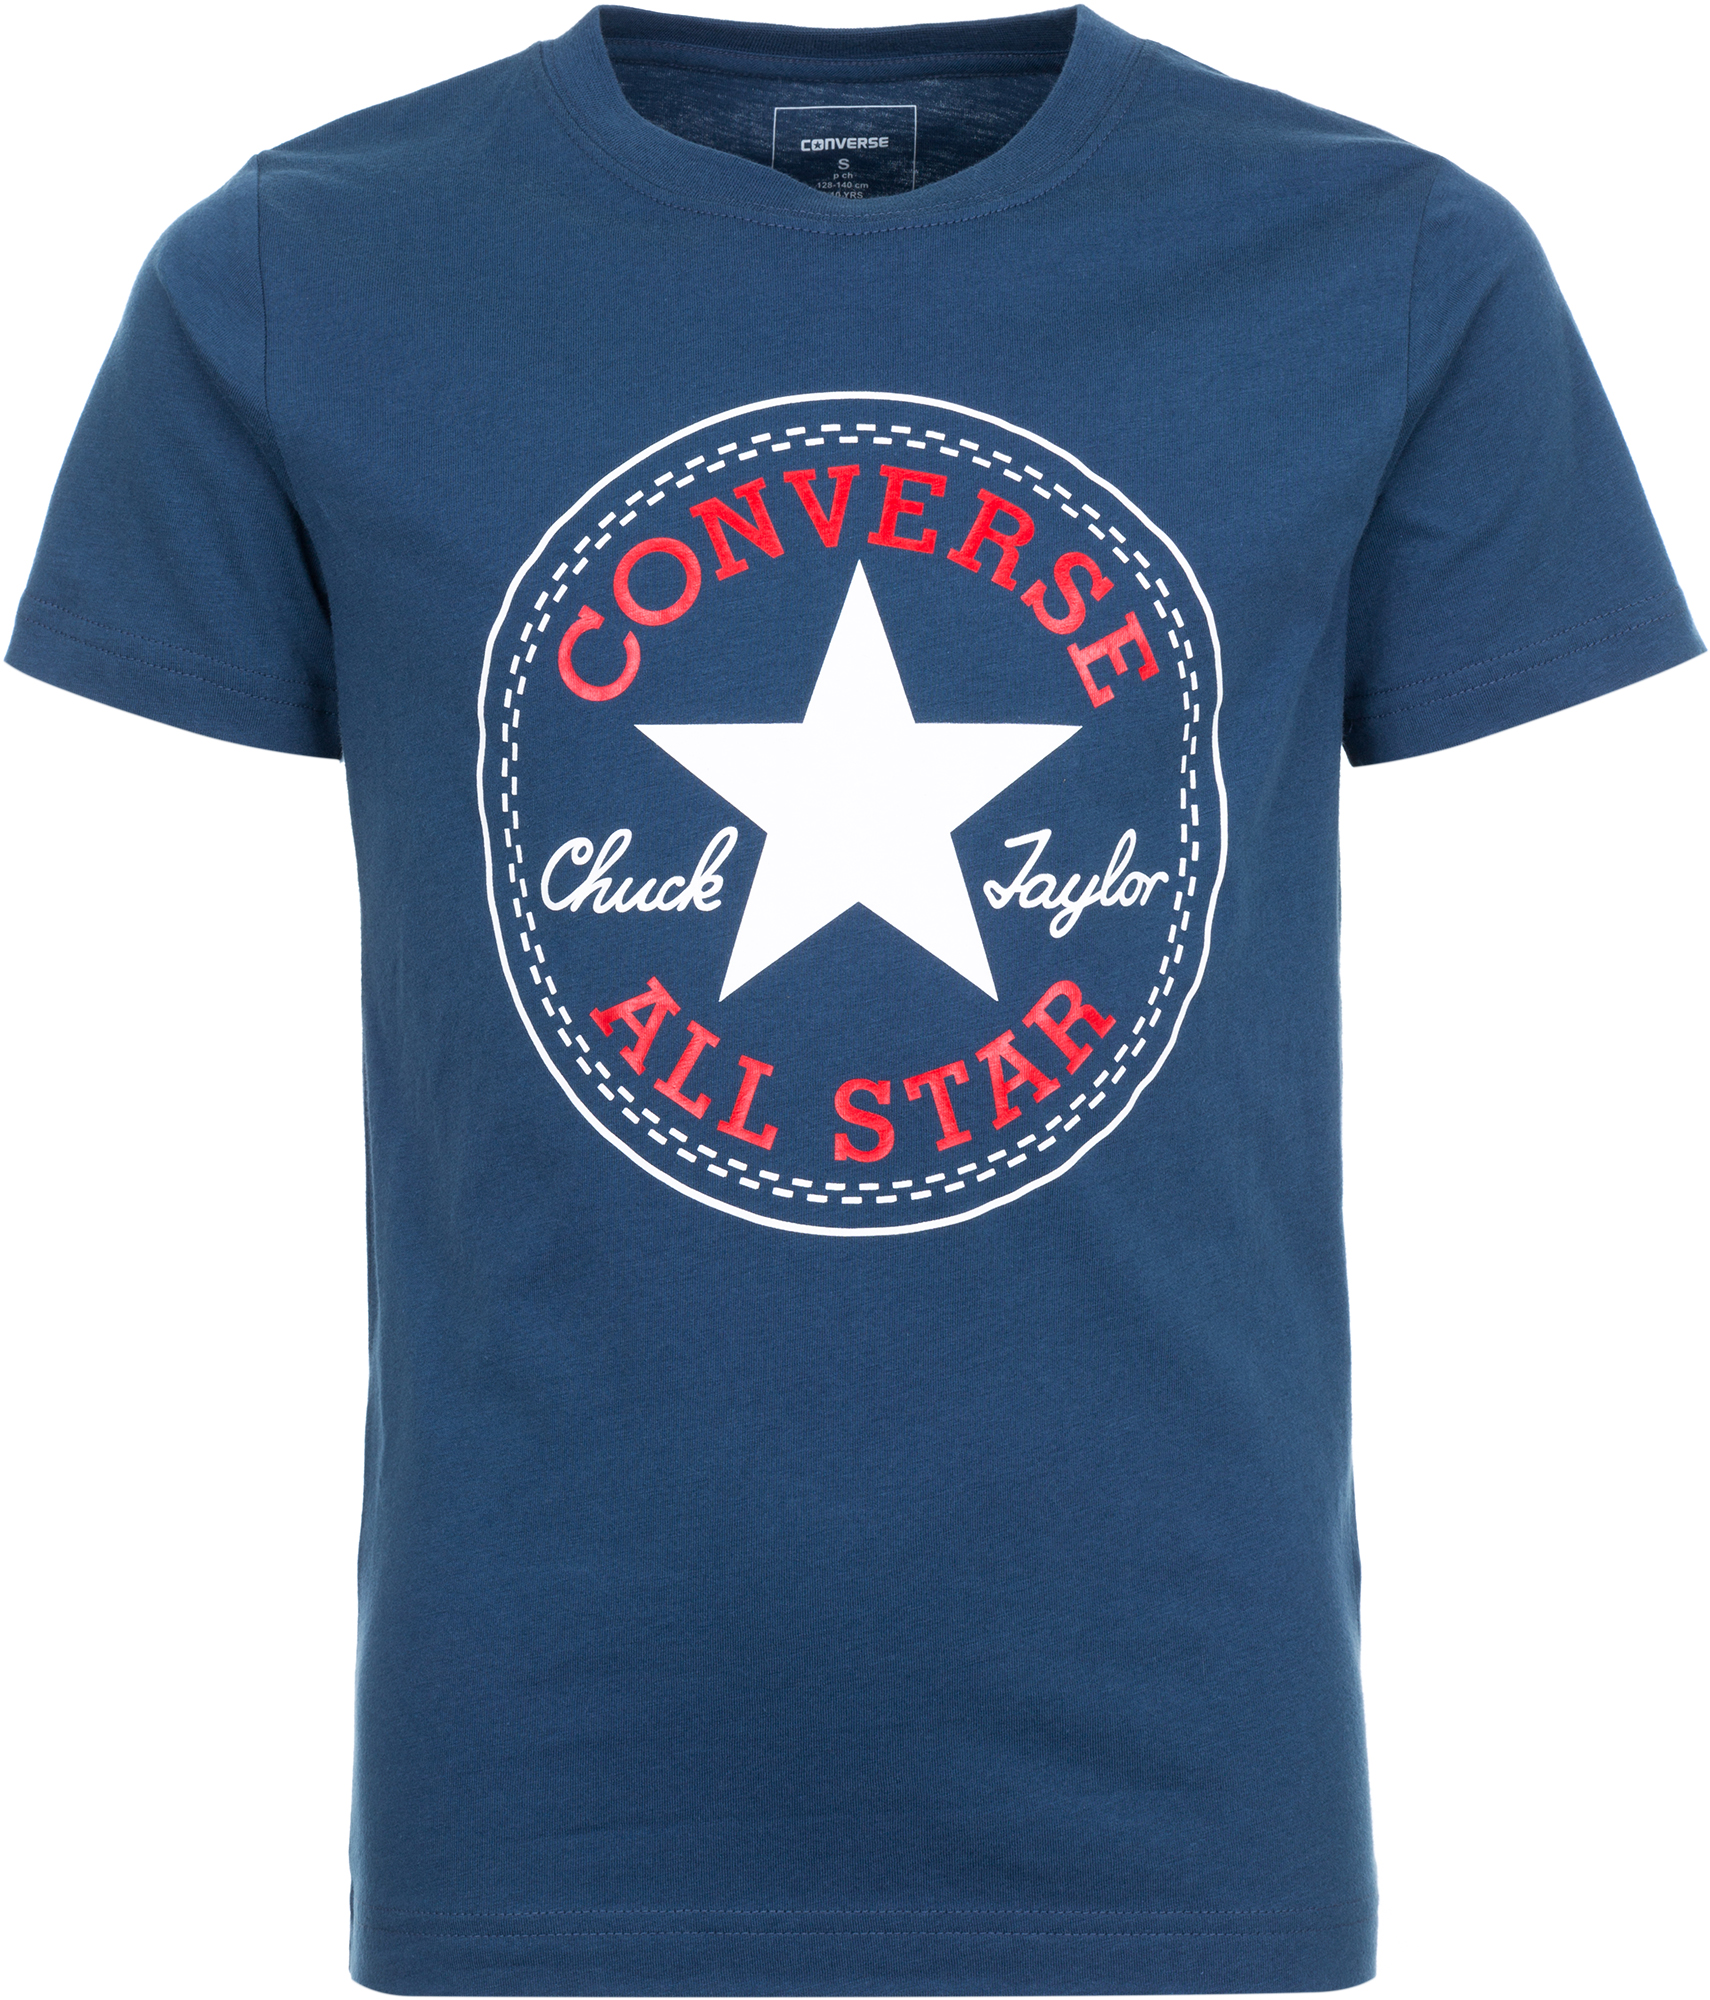 Converse Футболка для мальчиков Converse converse для детей